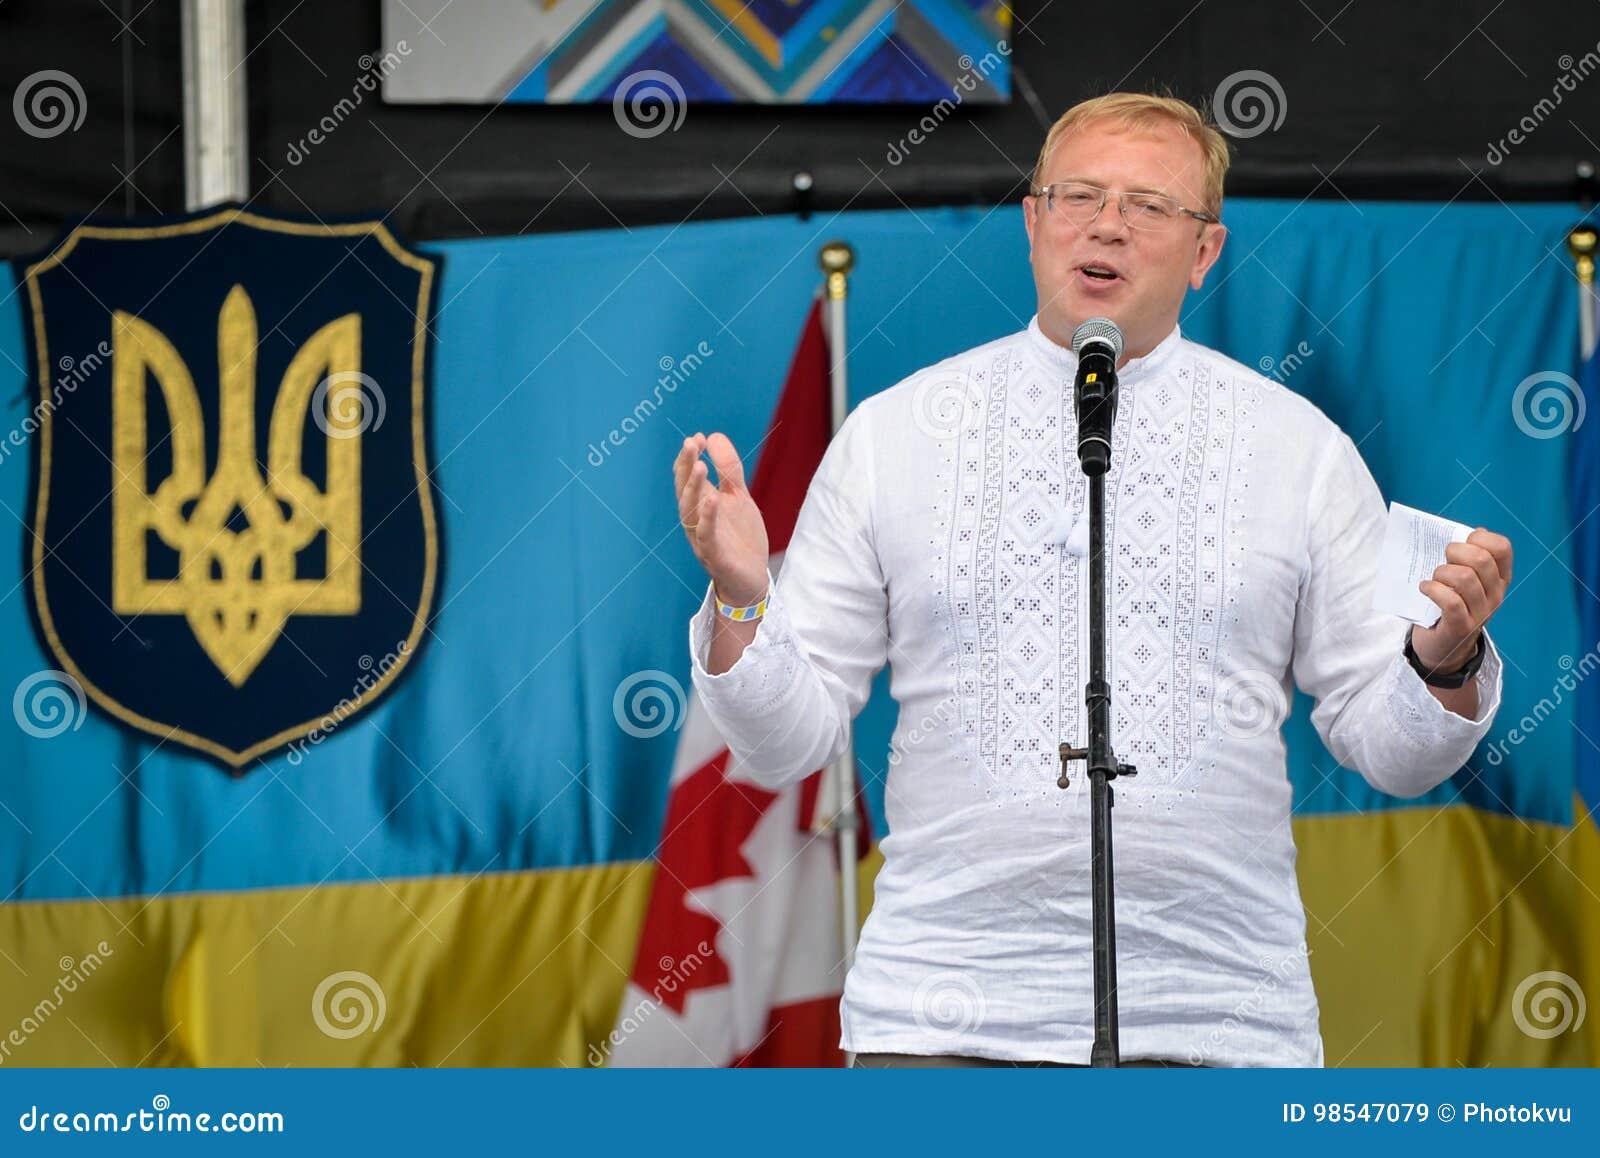 Ukrainian Independence Day In Toronto Editorial Stock Image - Image